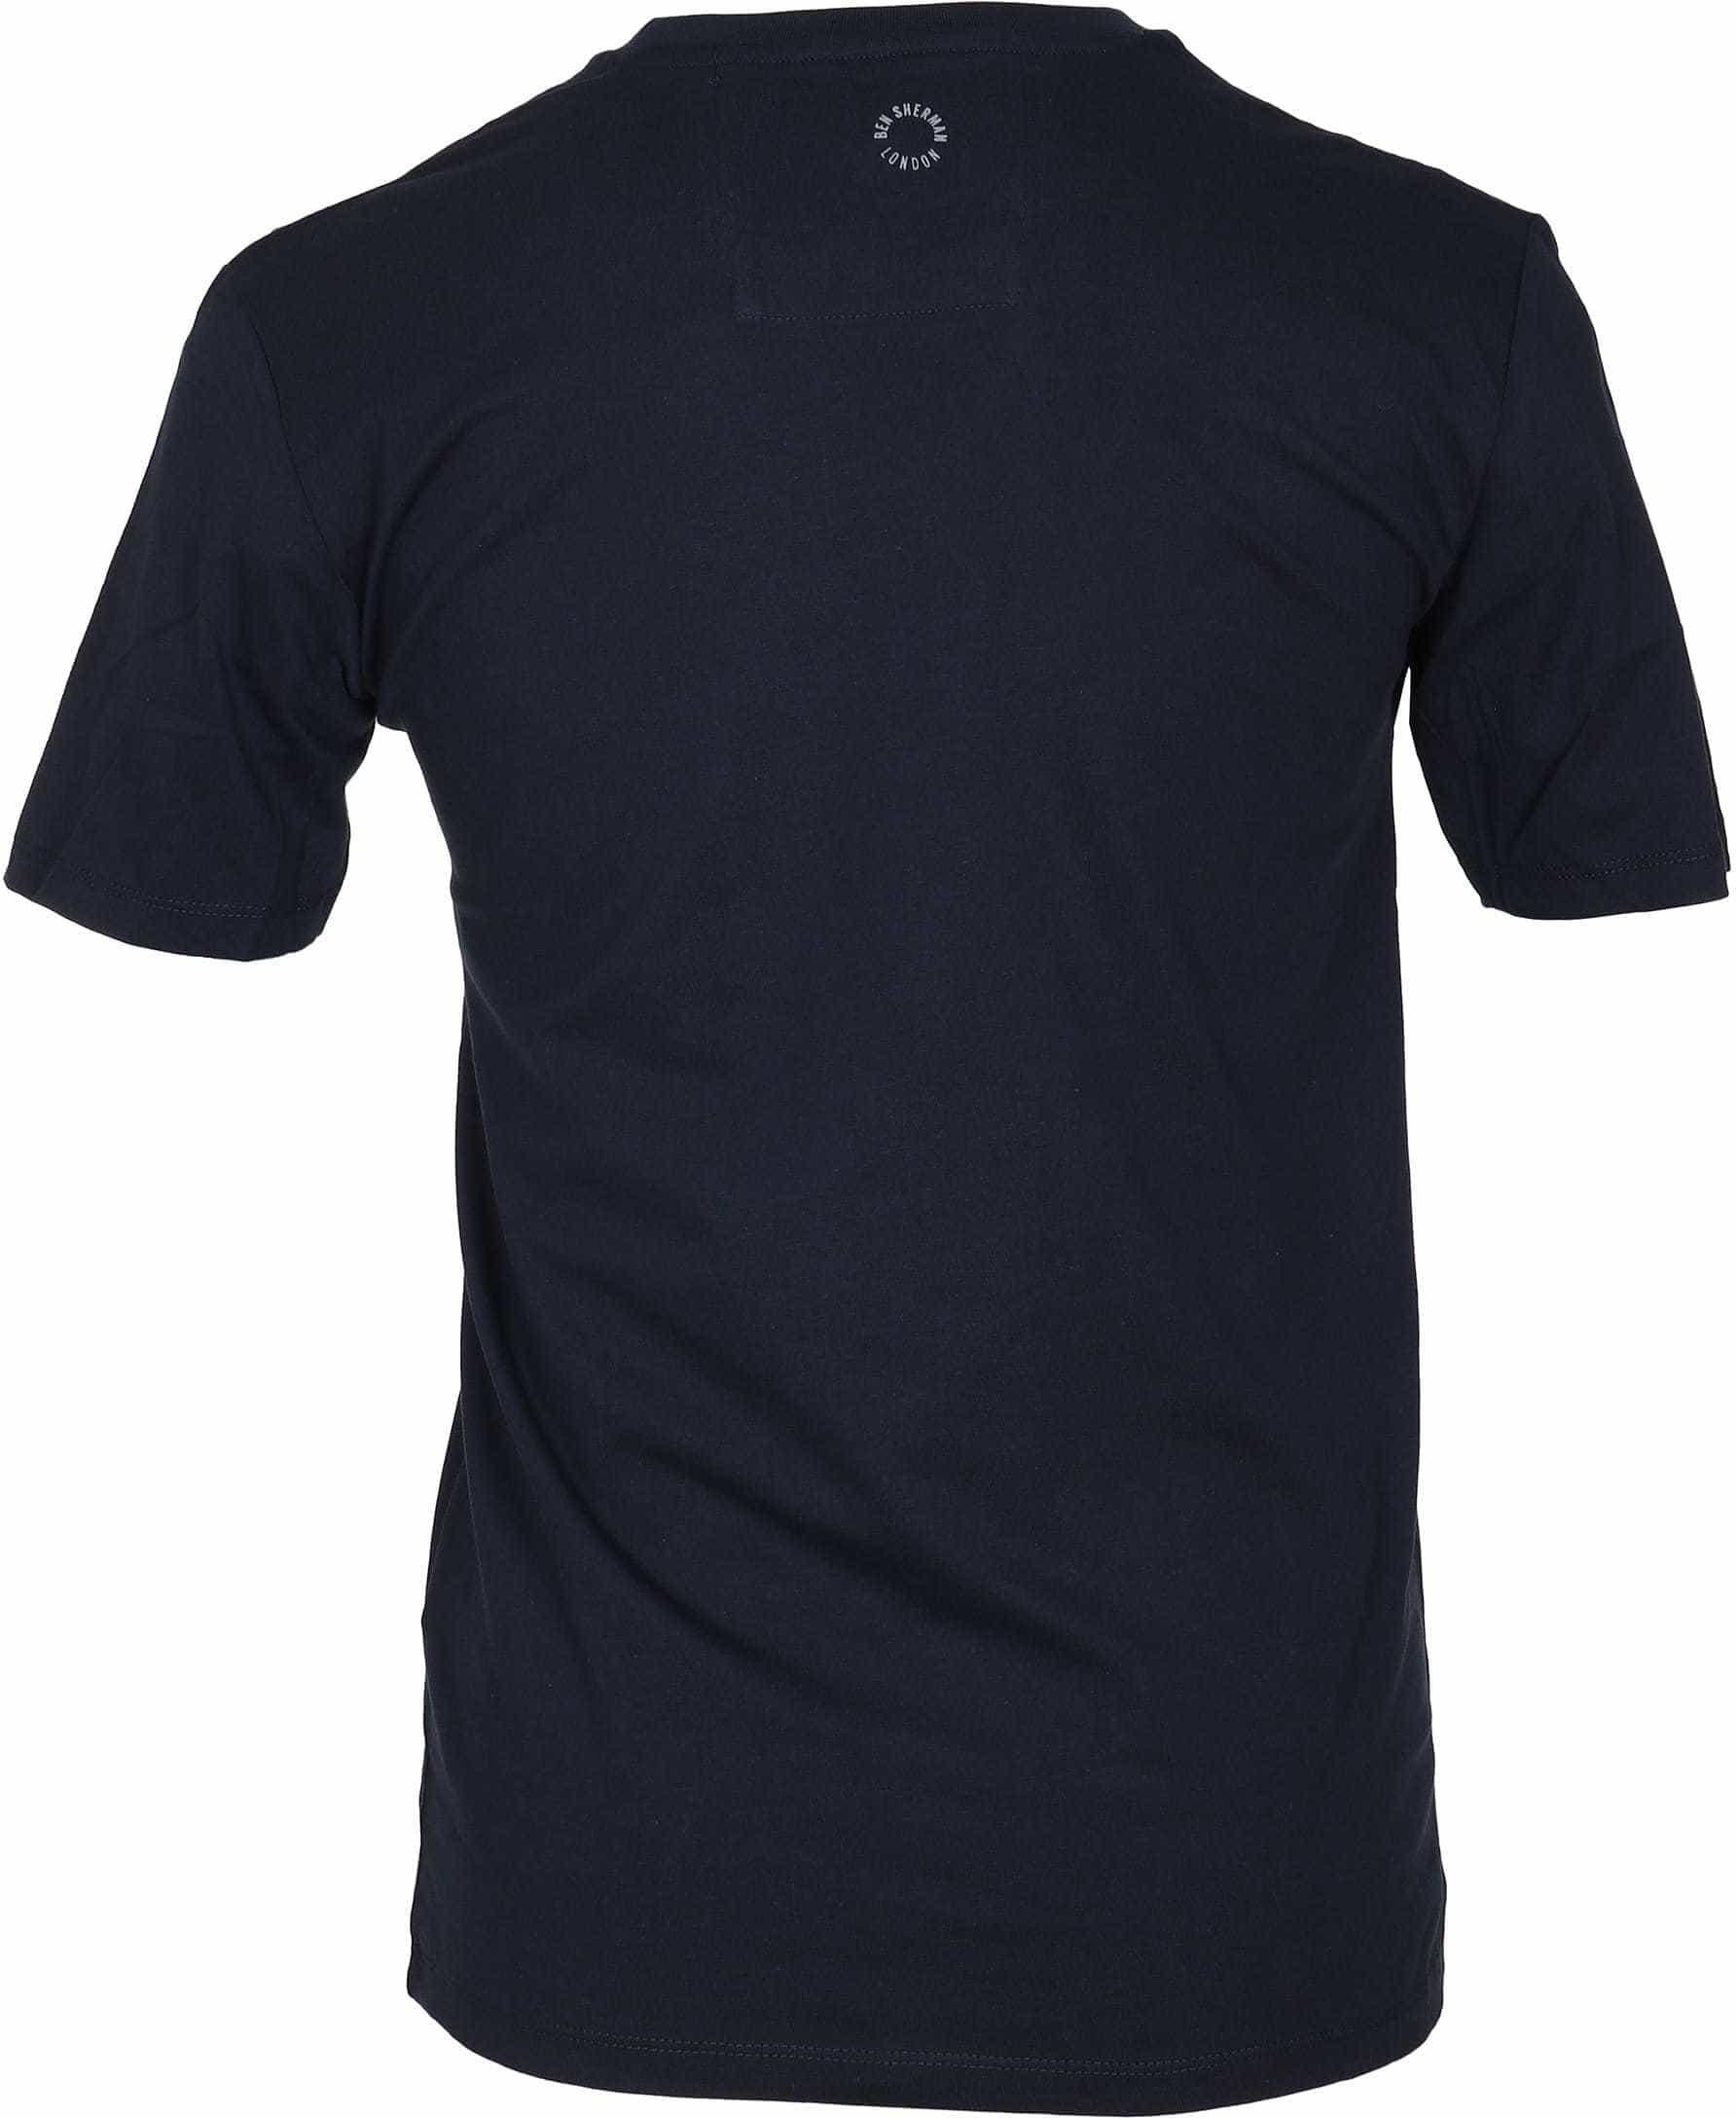 Ben Sherman T-Shirt Logo Dunkelblau foto 2